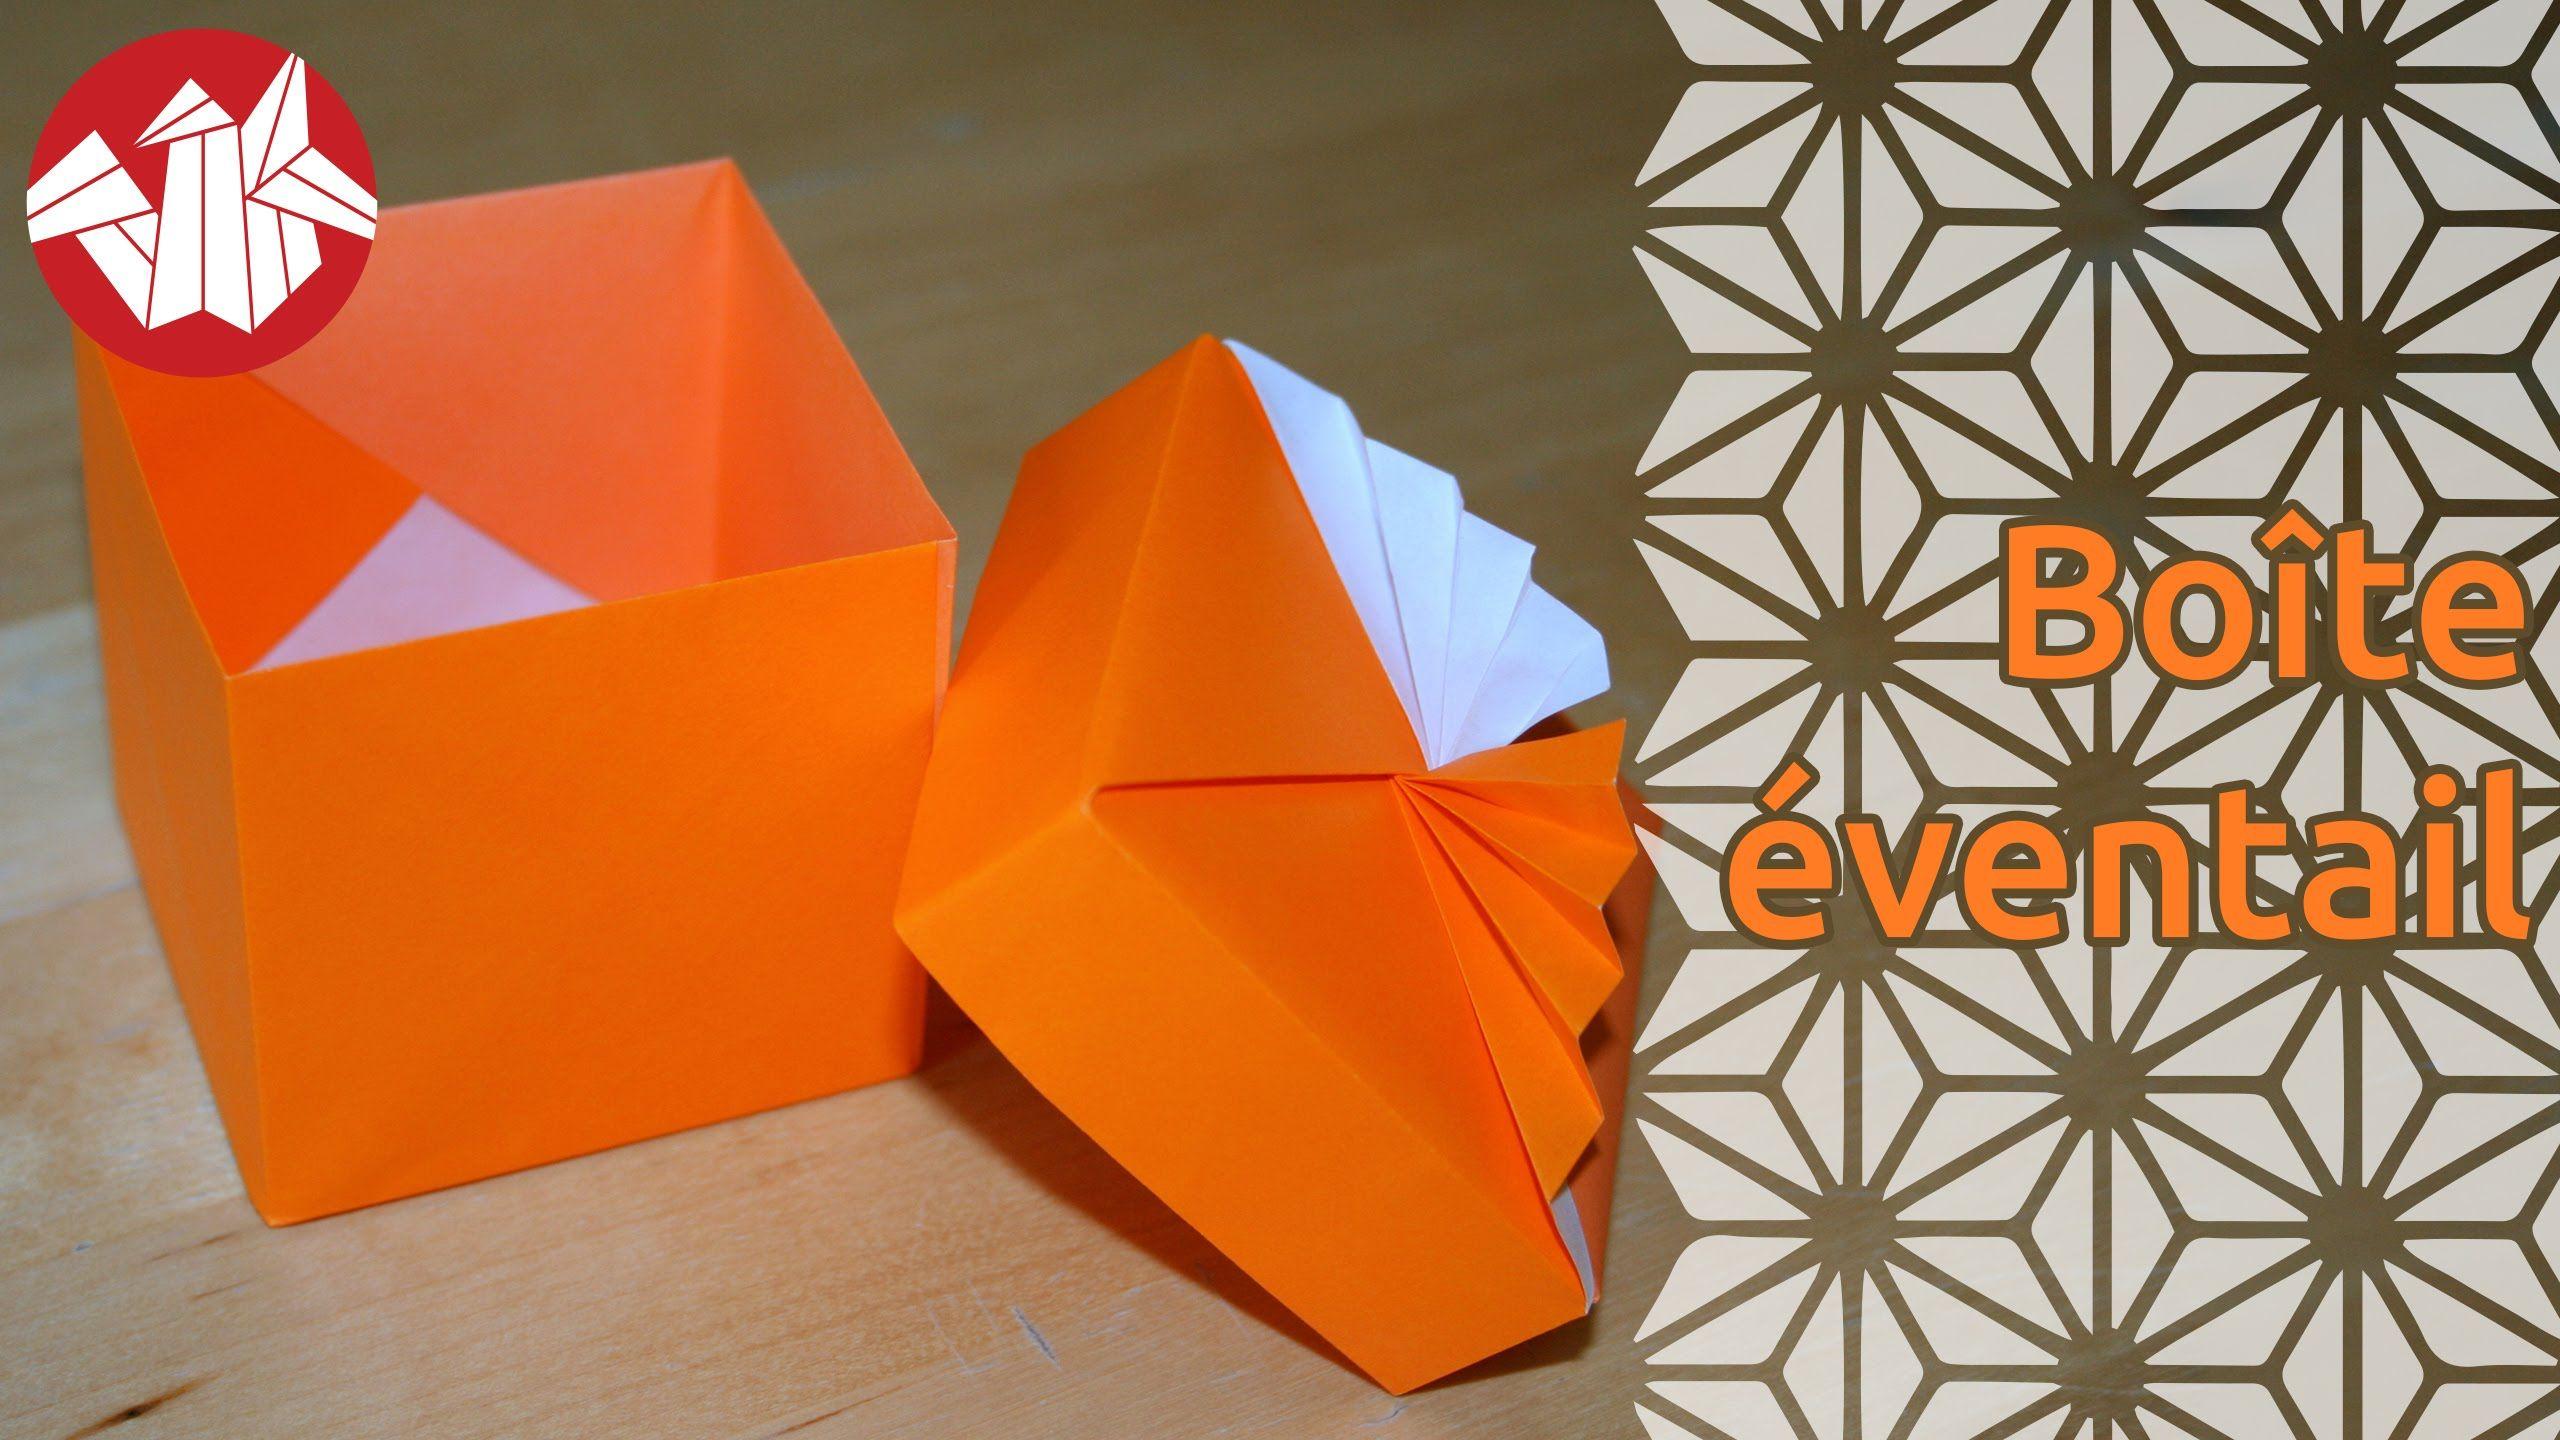 origami bo te ventail de tomoko fuse fancy box senbazuru  [ 2560 x 1440 Pixel ]